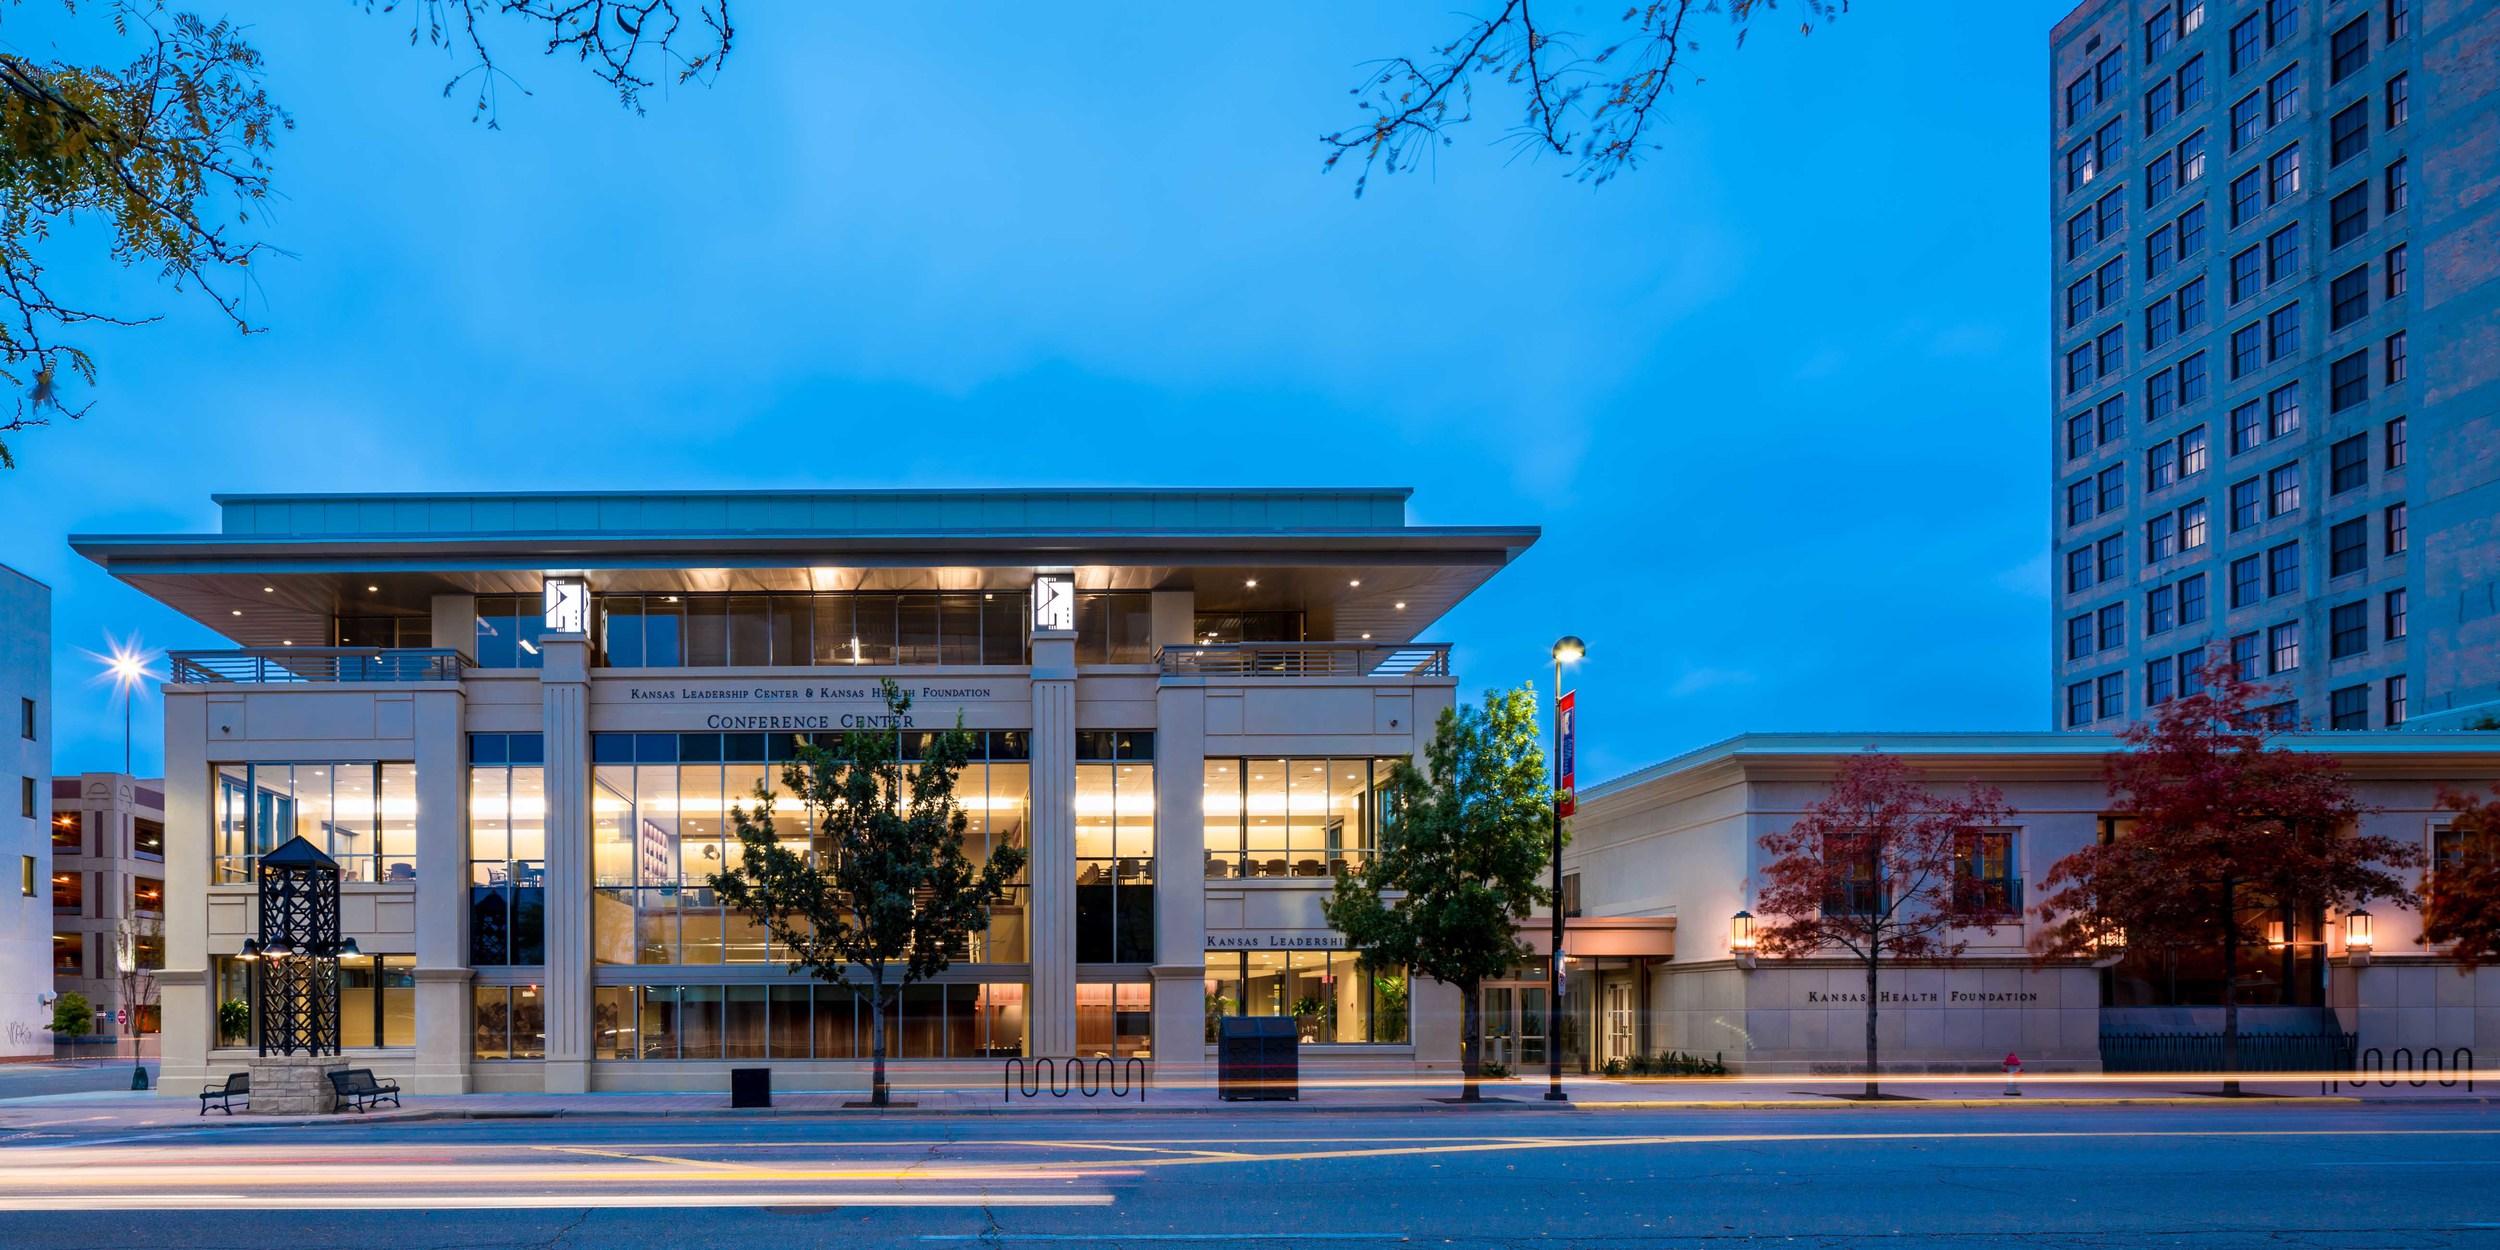 Kansas Leadership Center